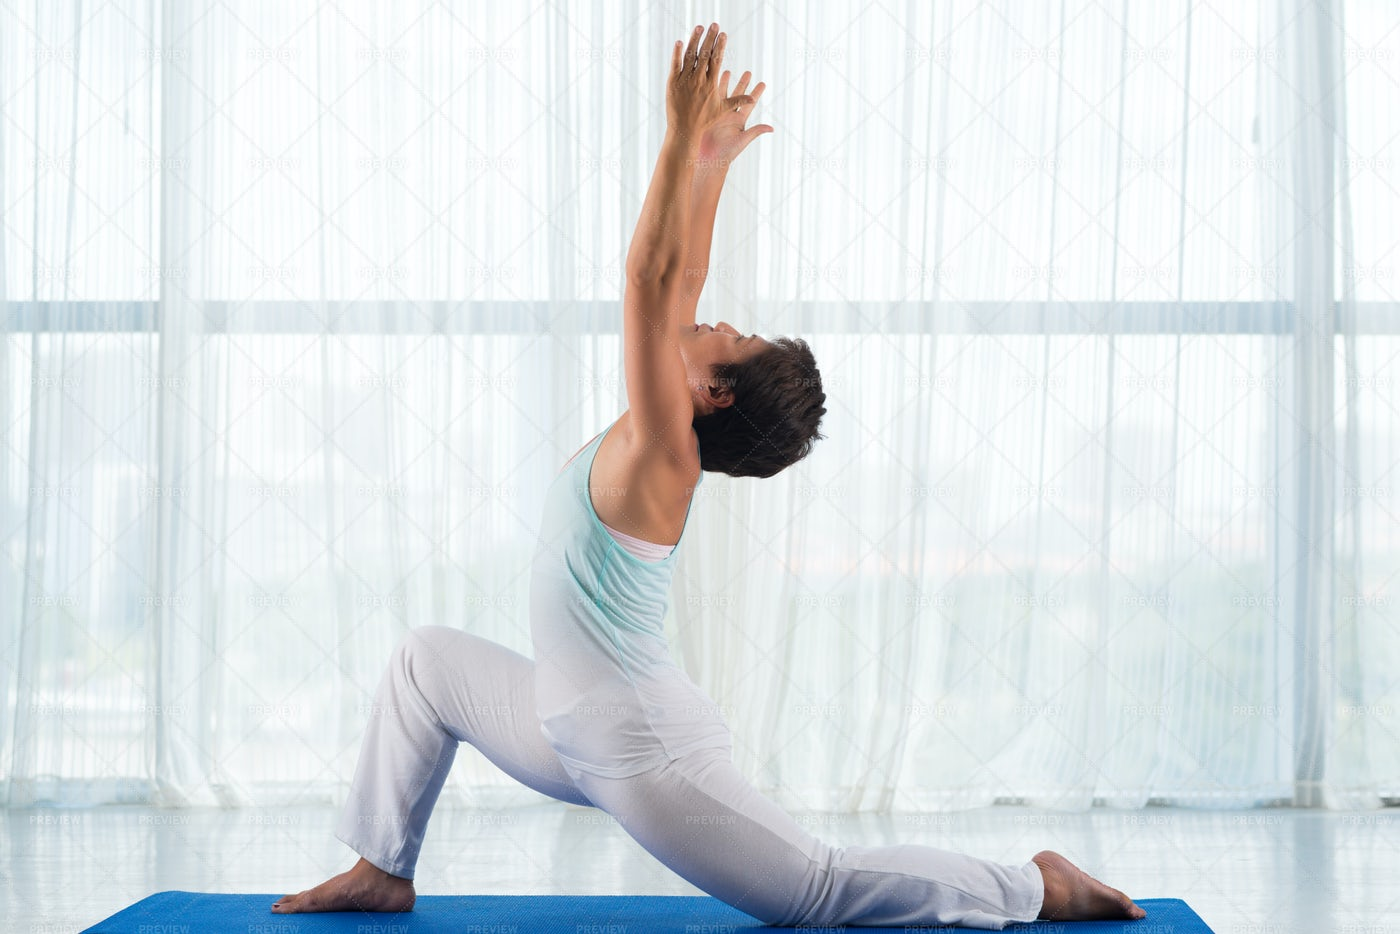 Stretching Exercise: Stock Photos